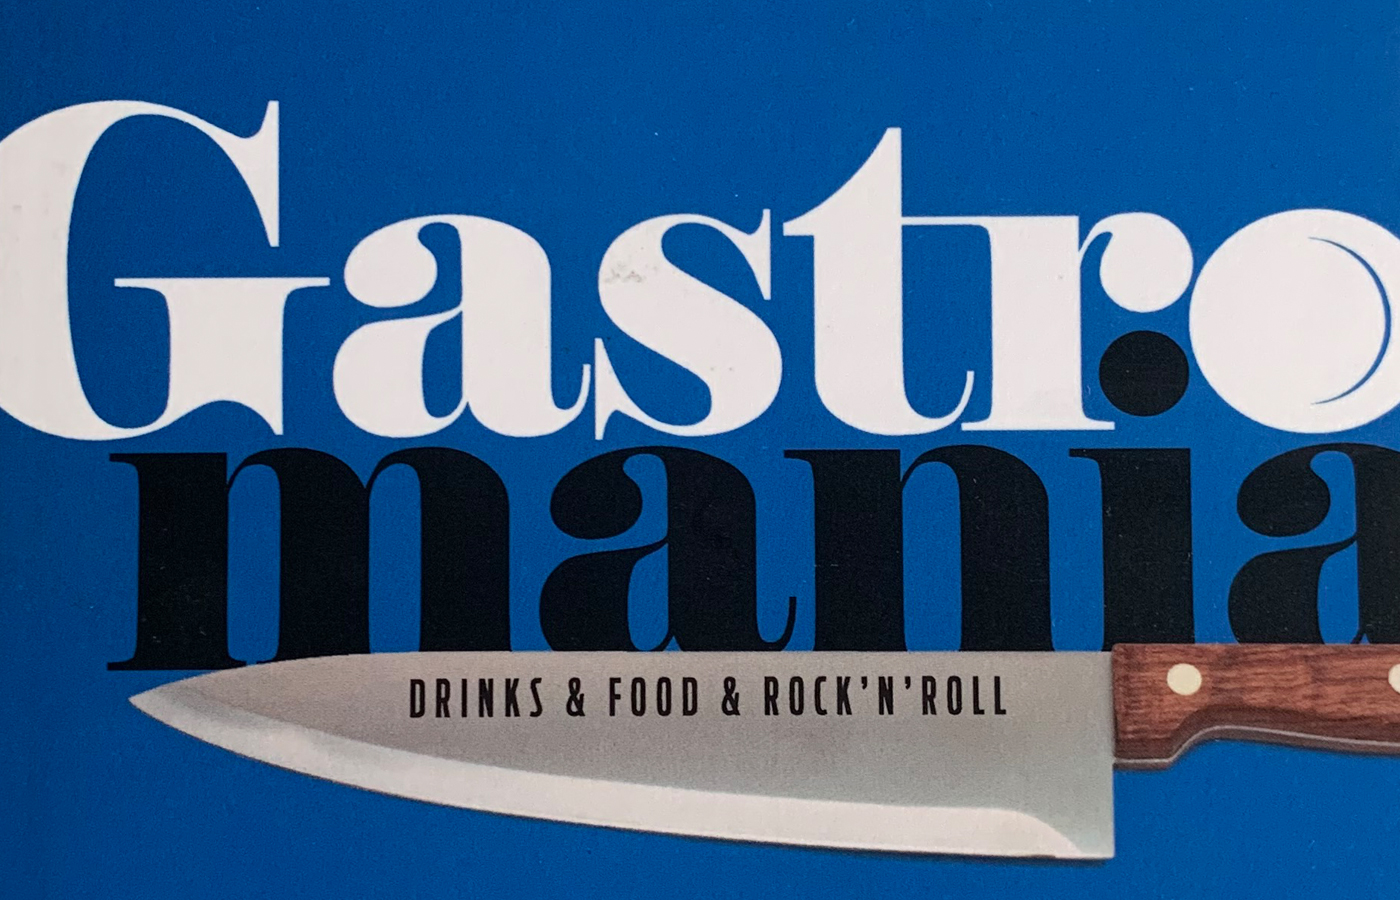 Gastromania: Drinks & Food & Rock'n'Roll